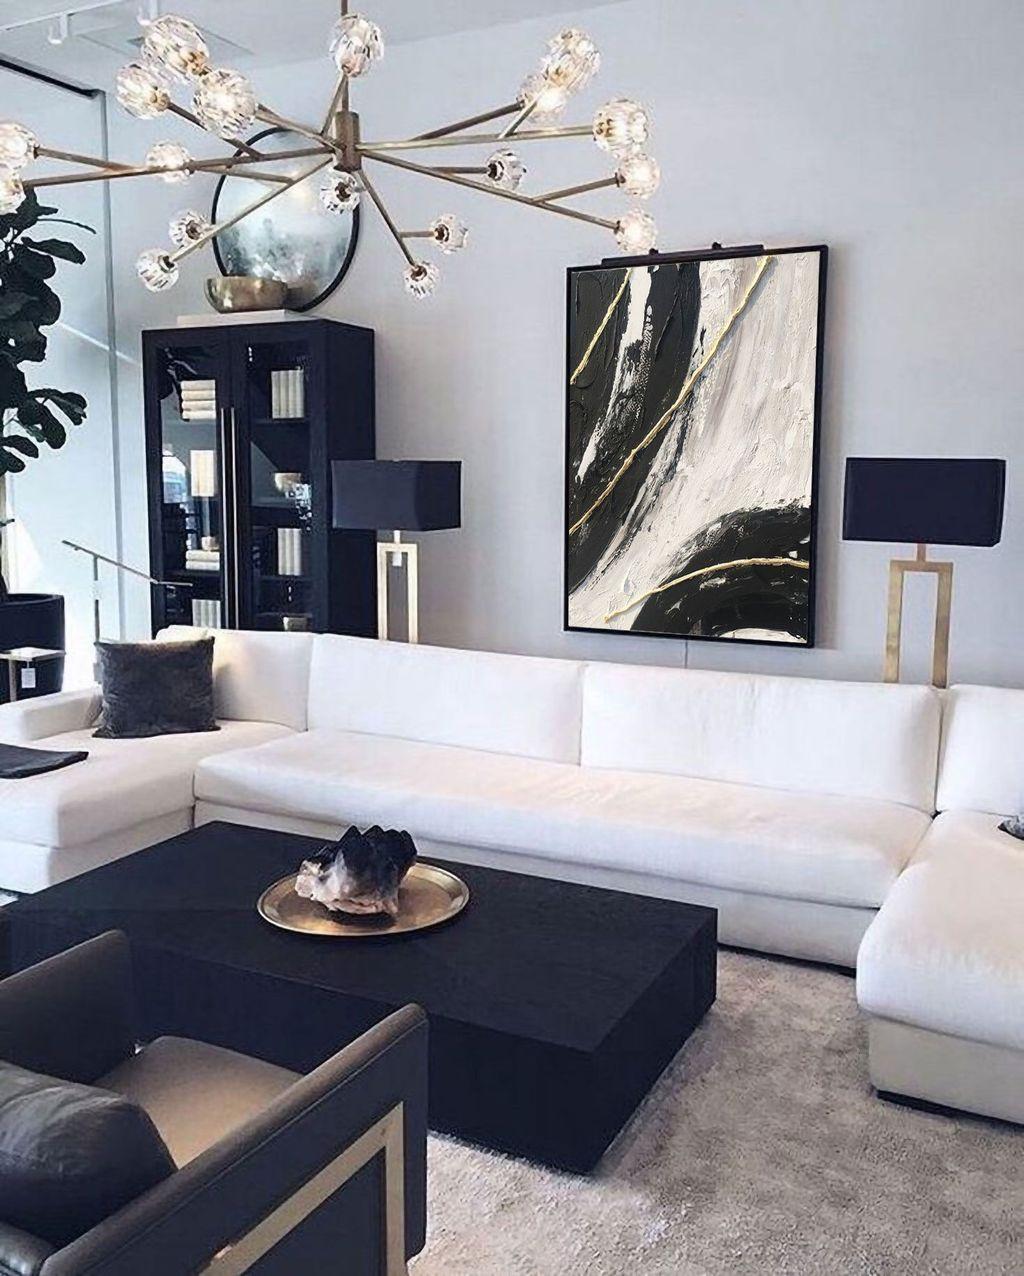 32 Awesome Modern Living Room Decor Ideas Black Living Room Black And White Living Room Farm House Living Room